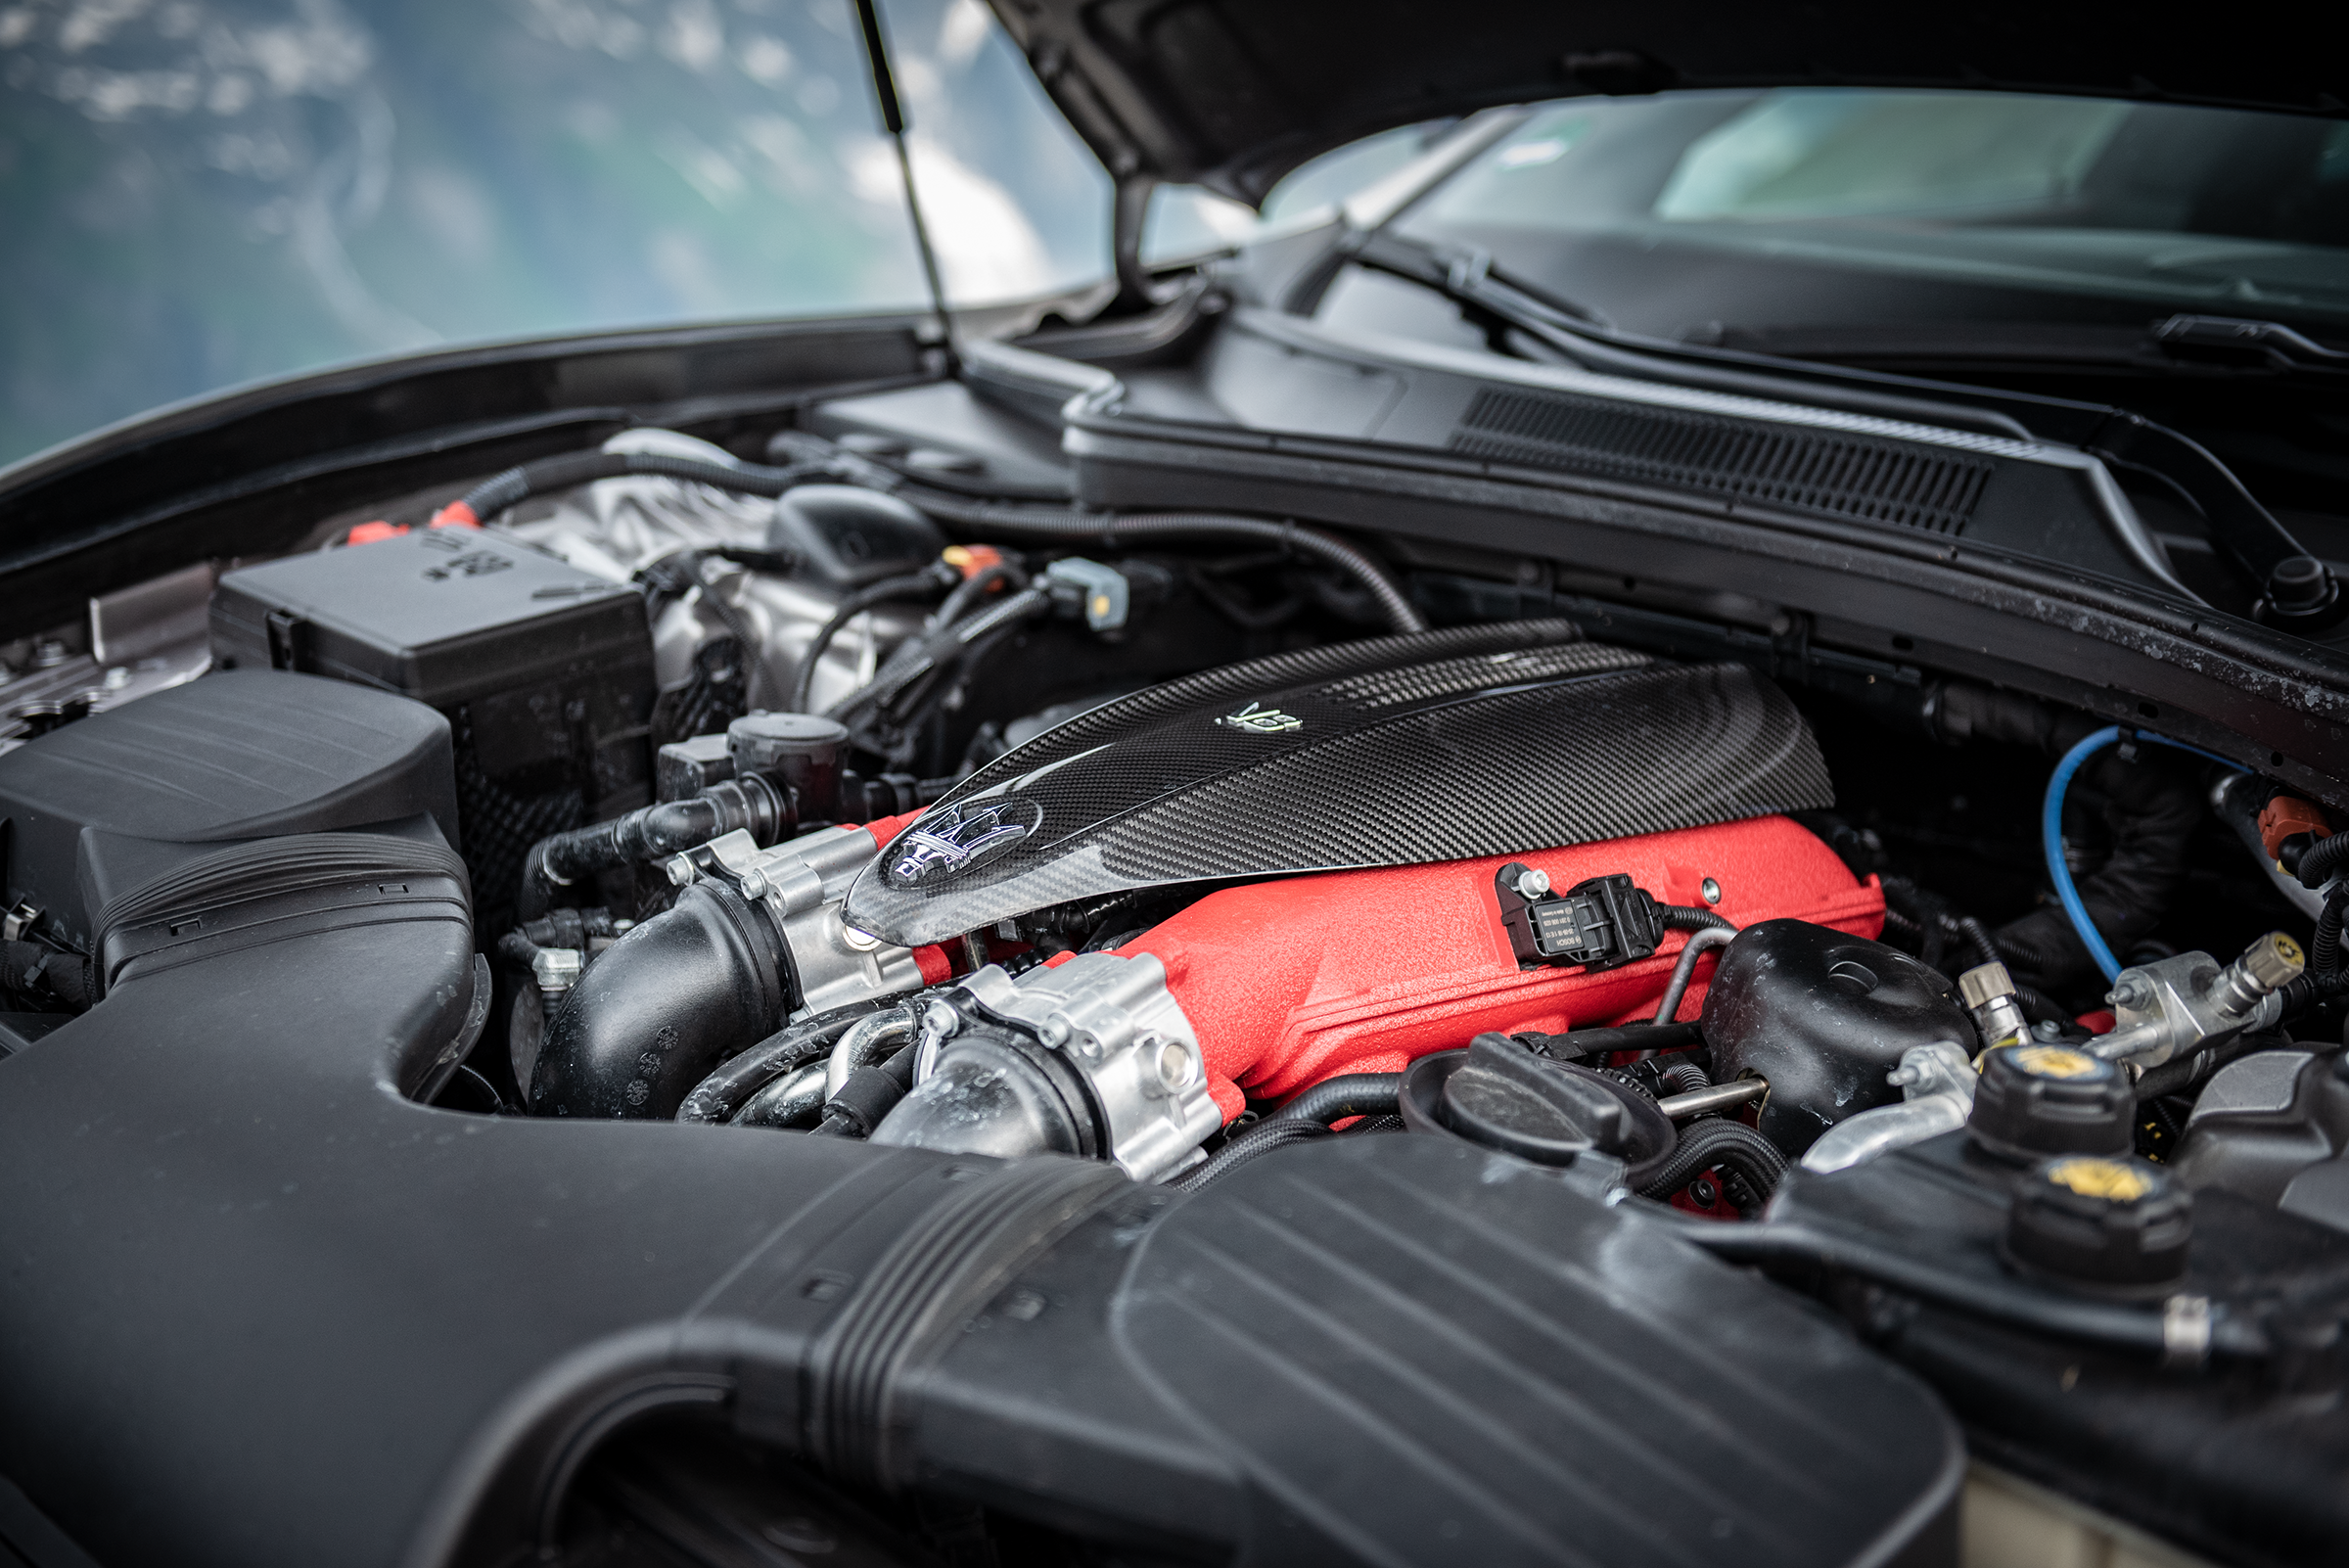 Maserati Ghibli Trofeo V8 engine